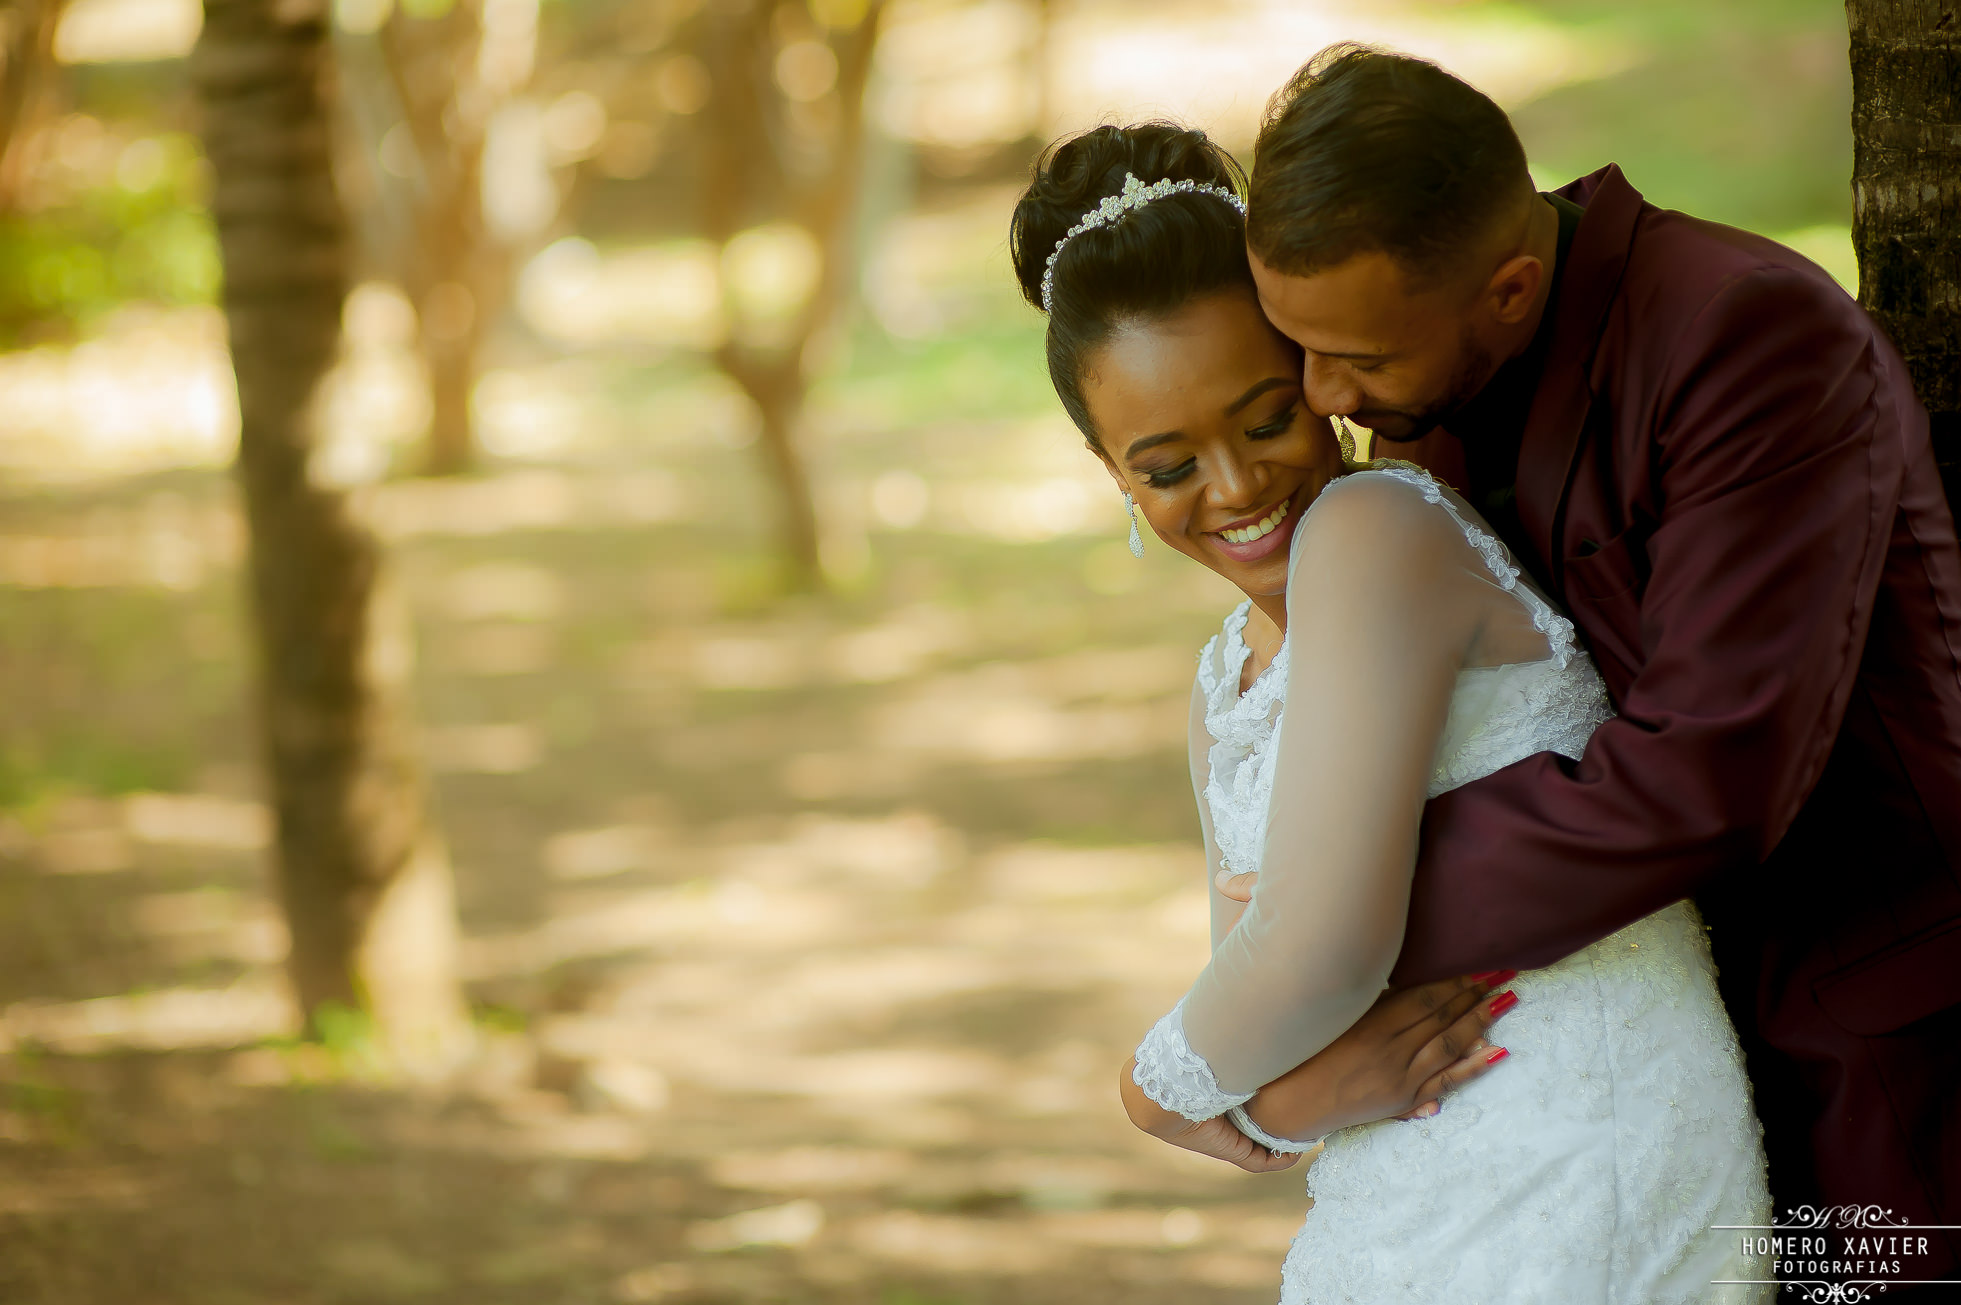 Casamento Nayara & Ilano